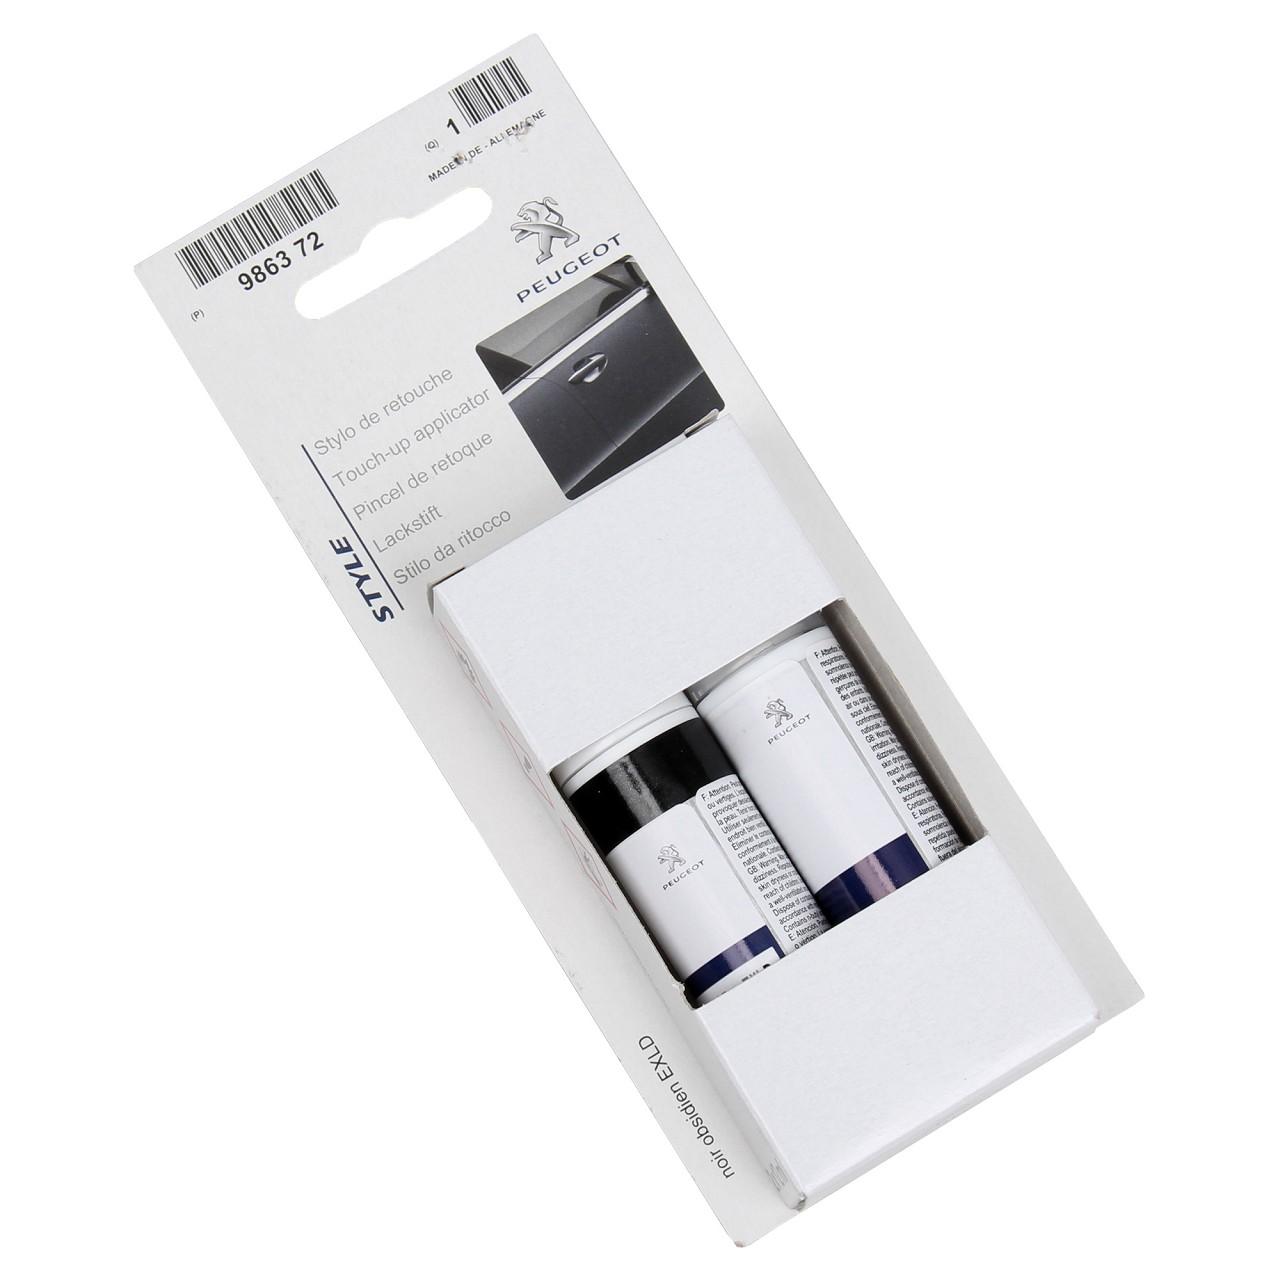 ORIGINAL PSA Lackstift Set SCHWARZ Obsidien EXL + 12ml Klarlack 9863.72